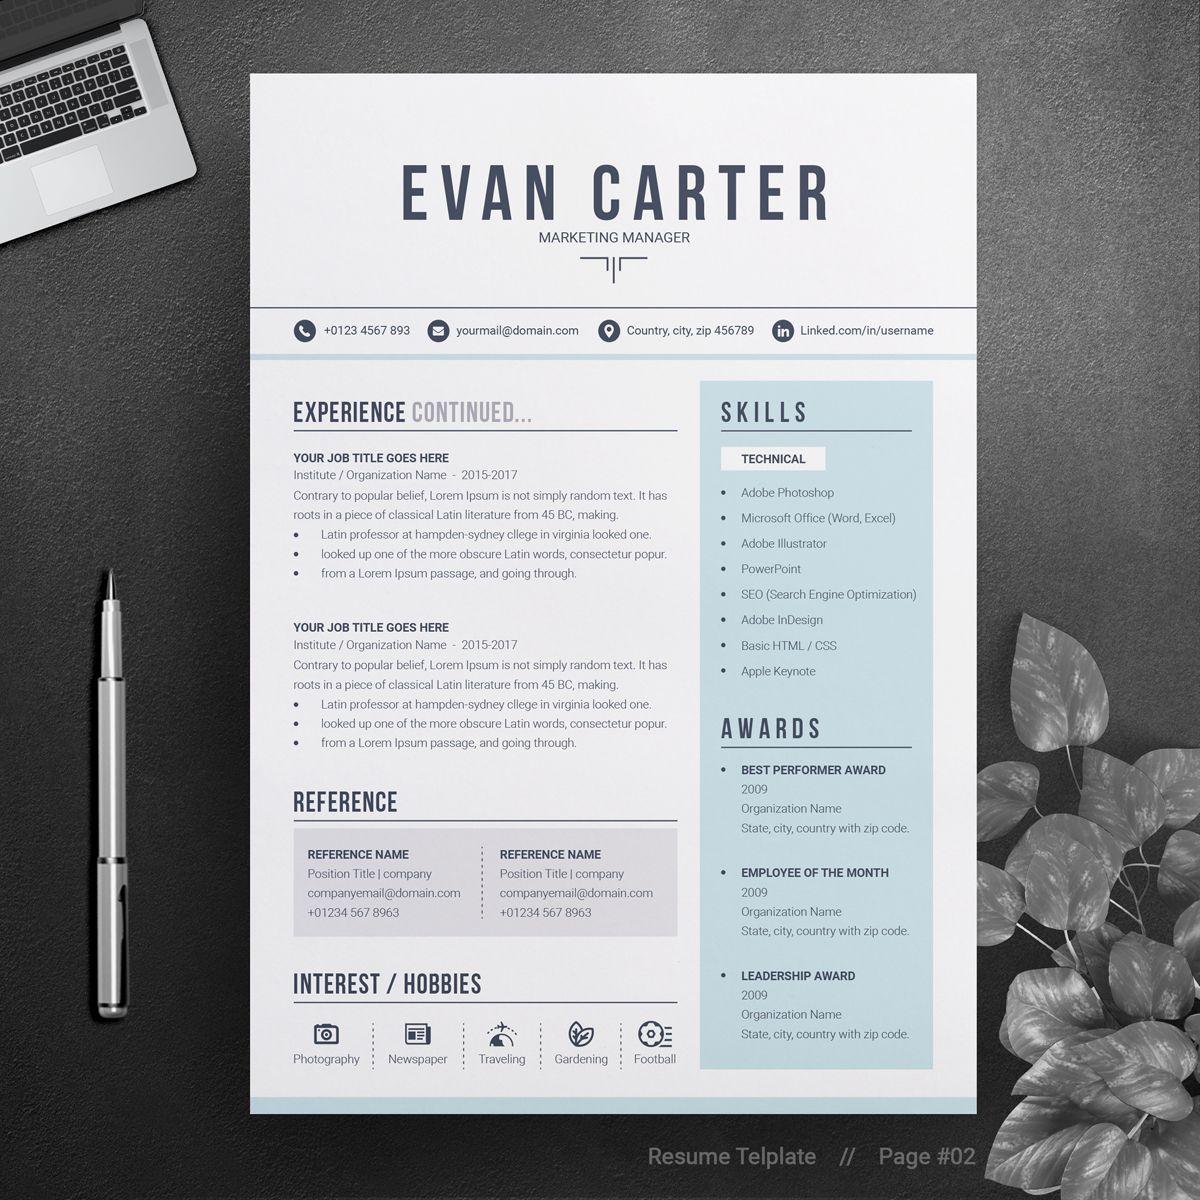 Evan resume template 74506 resume design resume